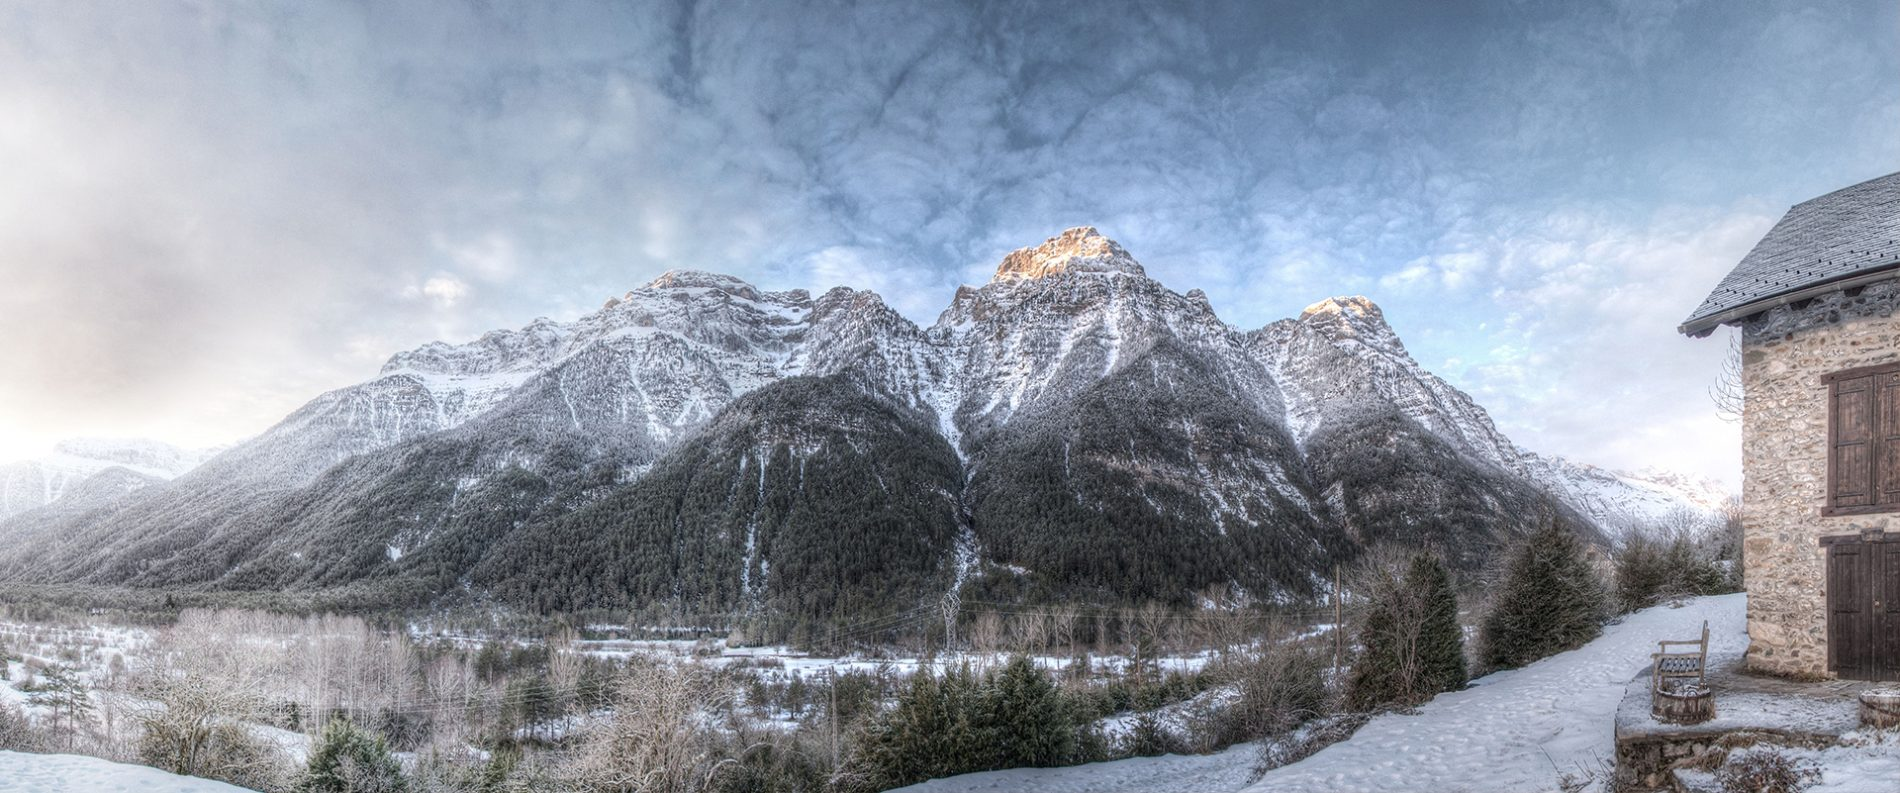 valle de Pineta nevado